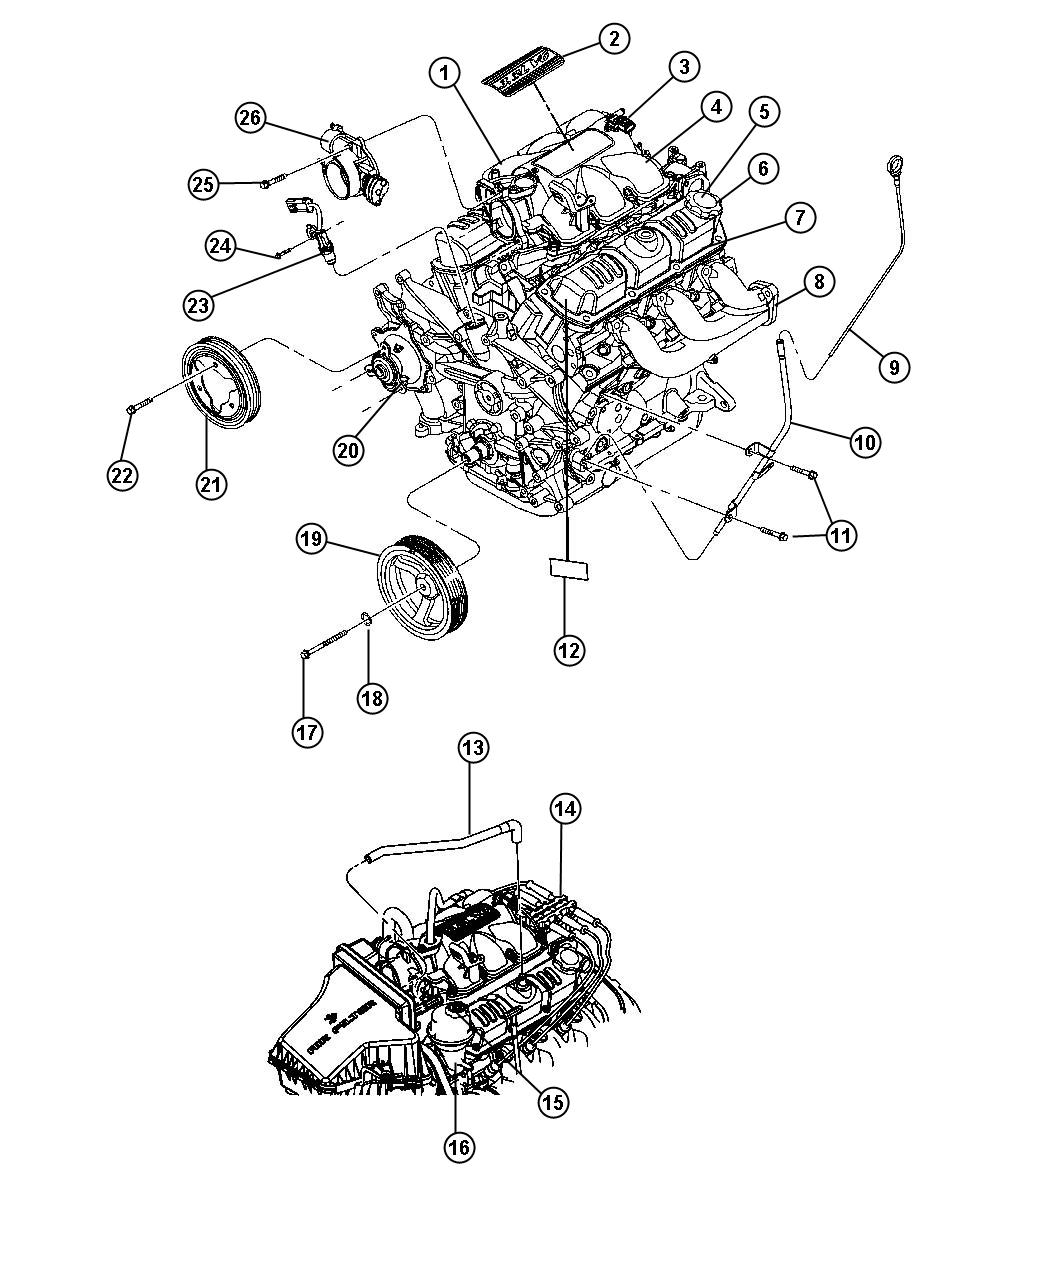 [DIAGRAM] Chevy 2 8l V6 Engine Diagram FULL Version HD